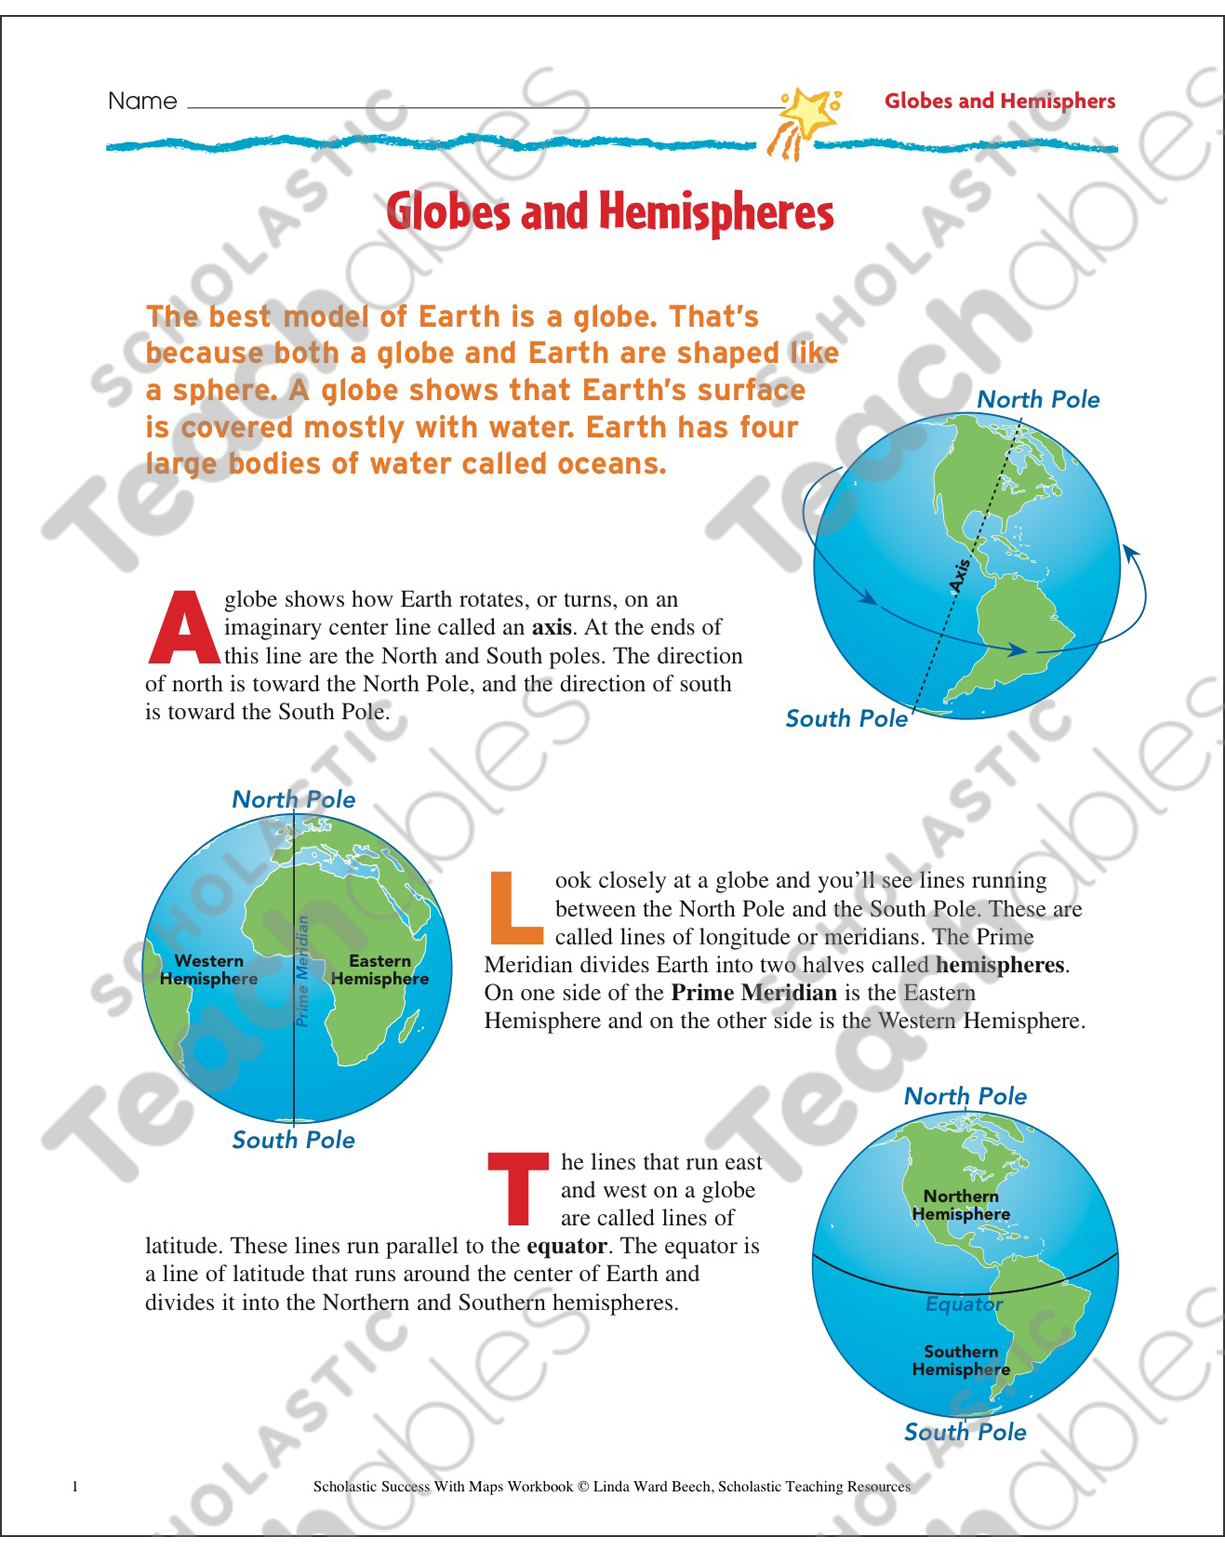 hight resolution of Happy Hemispheres Worksheet Answers - Nidecmege